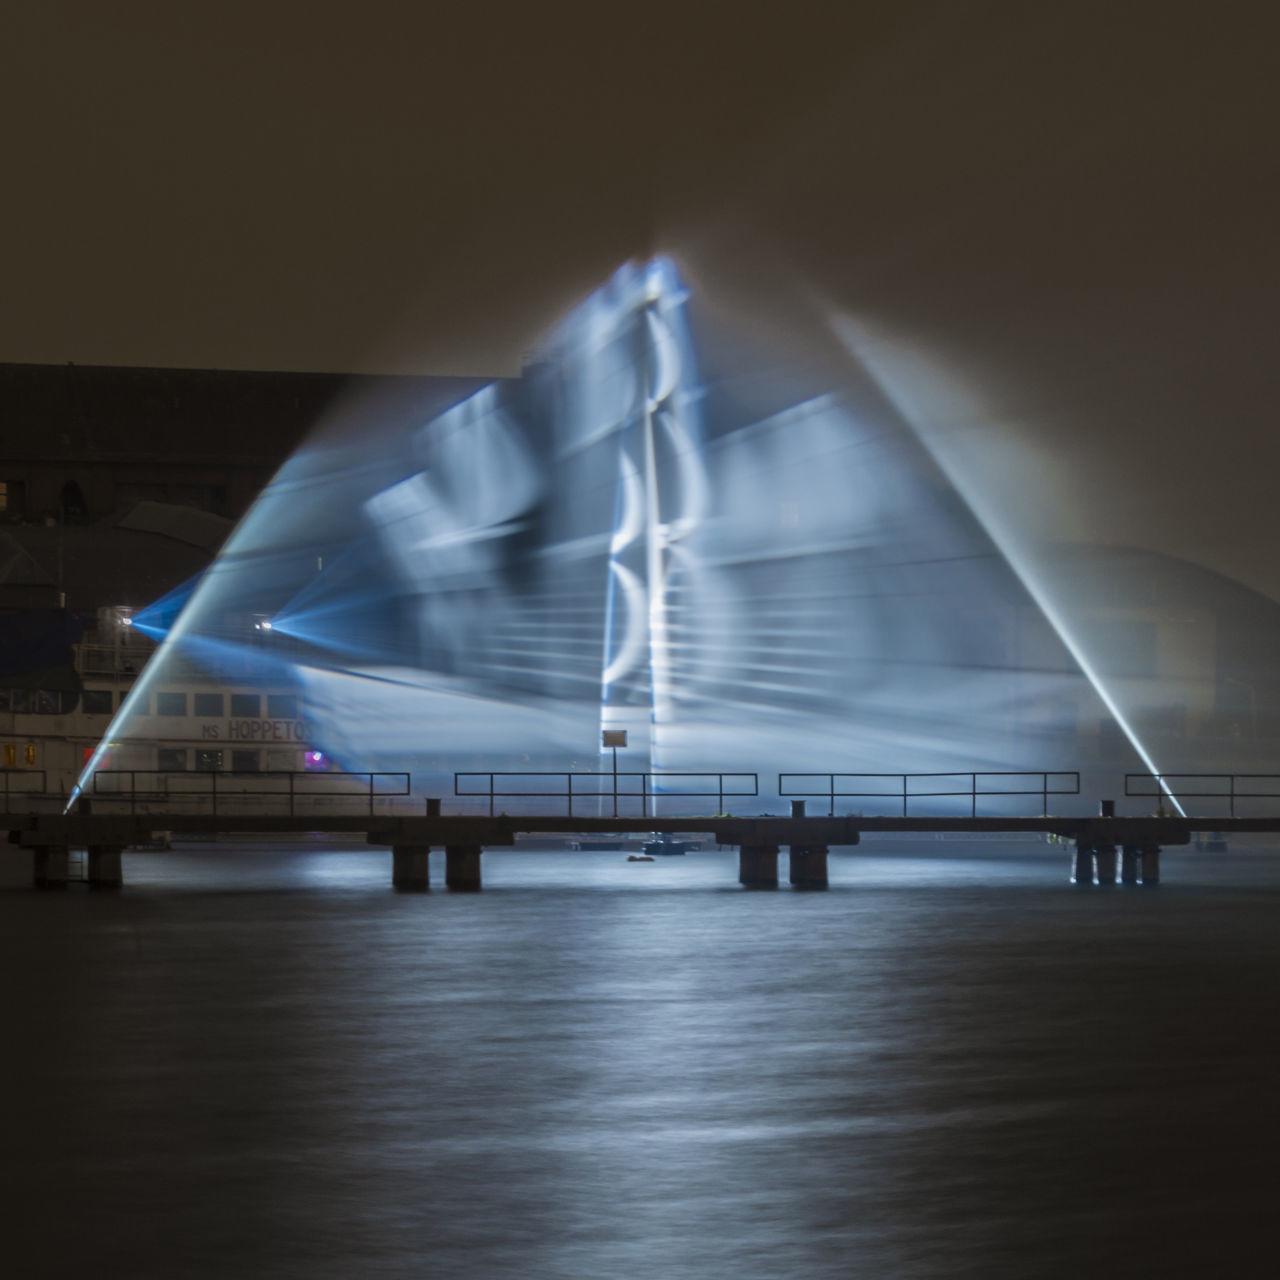 Festivaloflights Geisterschiff Ghostship Hologram Illuminated Illumination Night No People Osthafen Outdoors River Spree Sky Spree Transportation Water